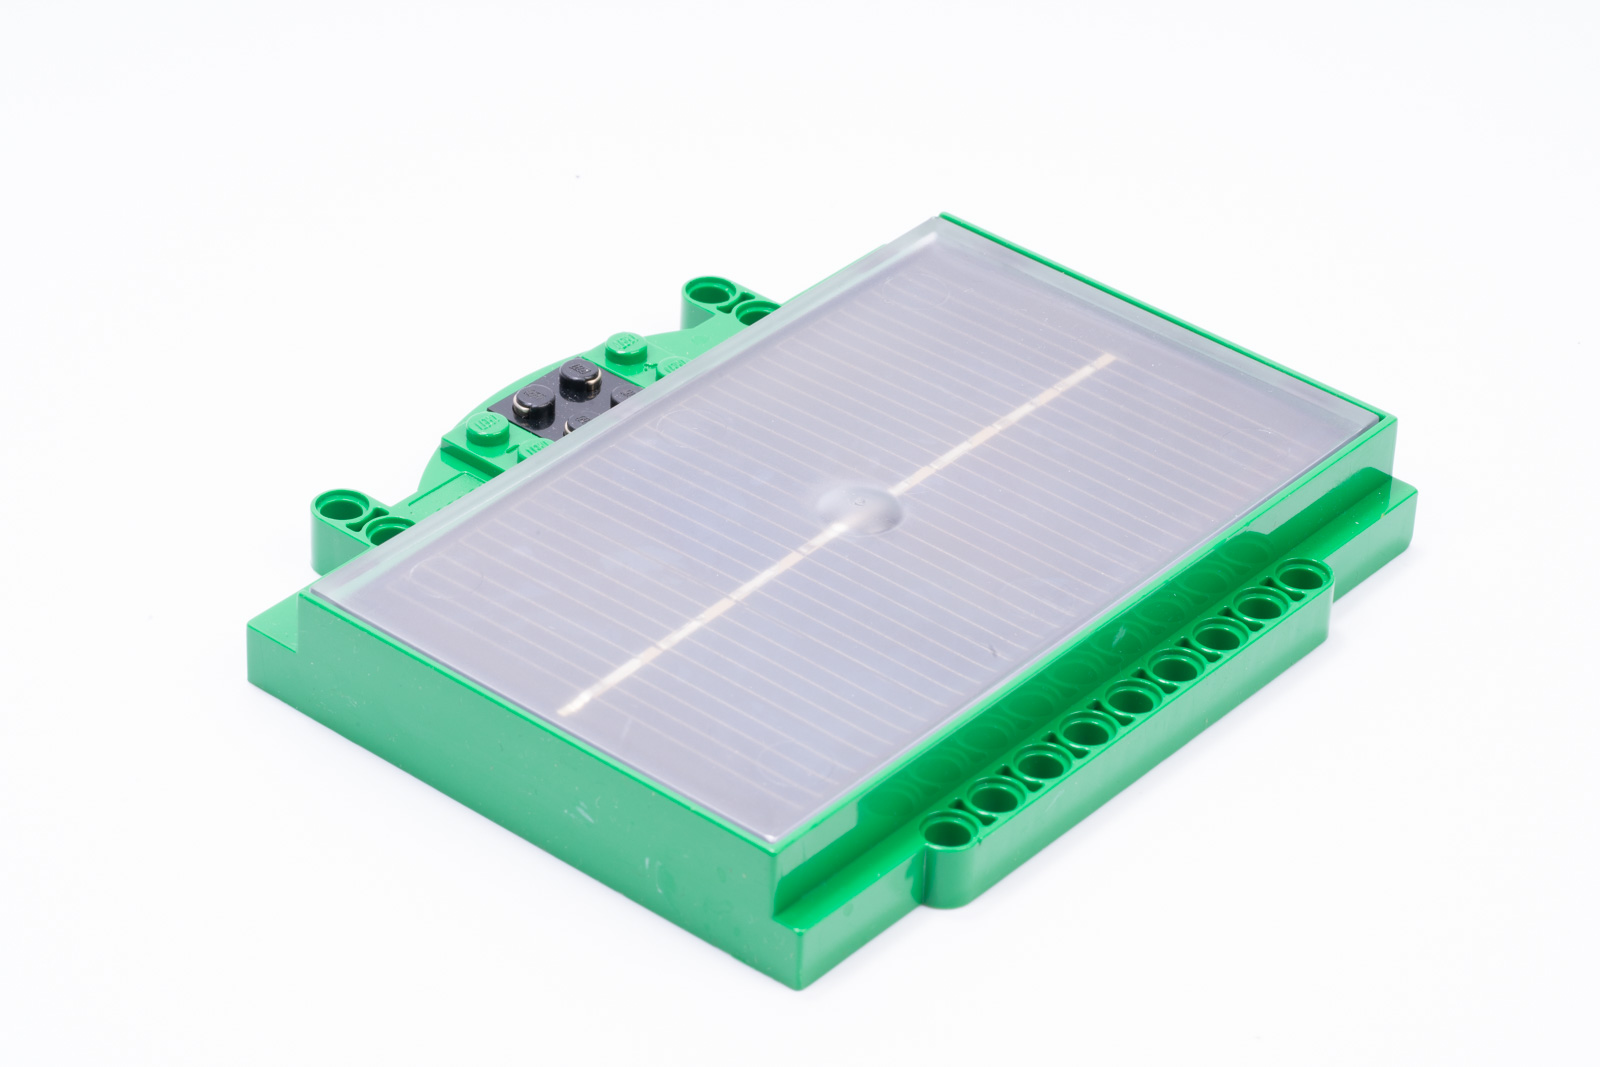 Lego Solar Panel Toy